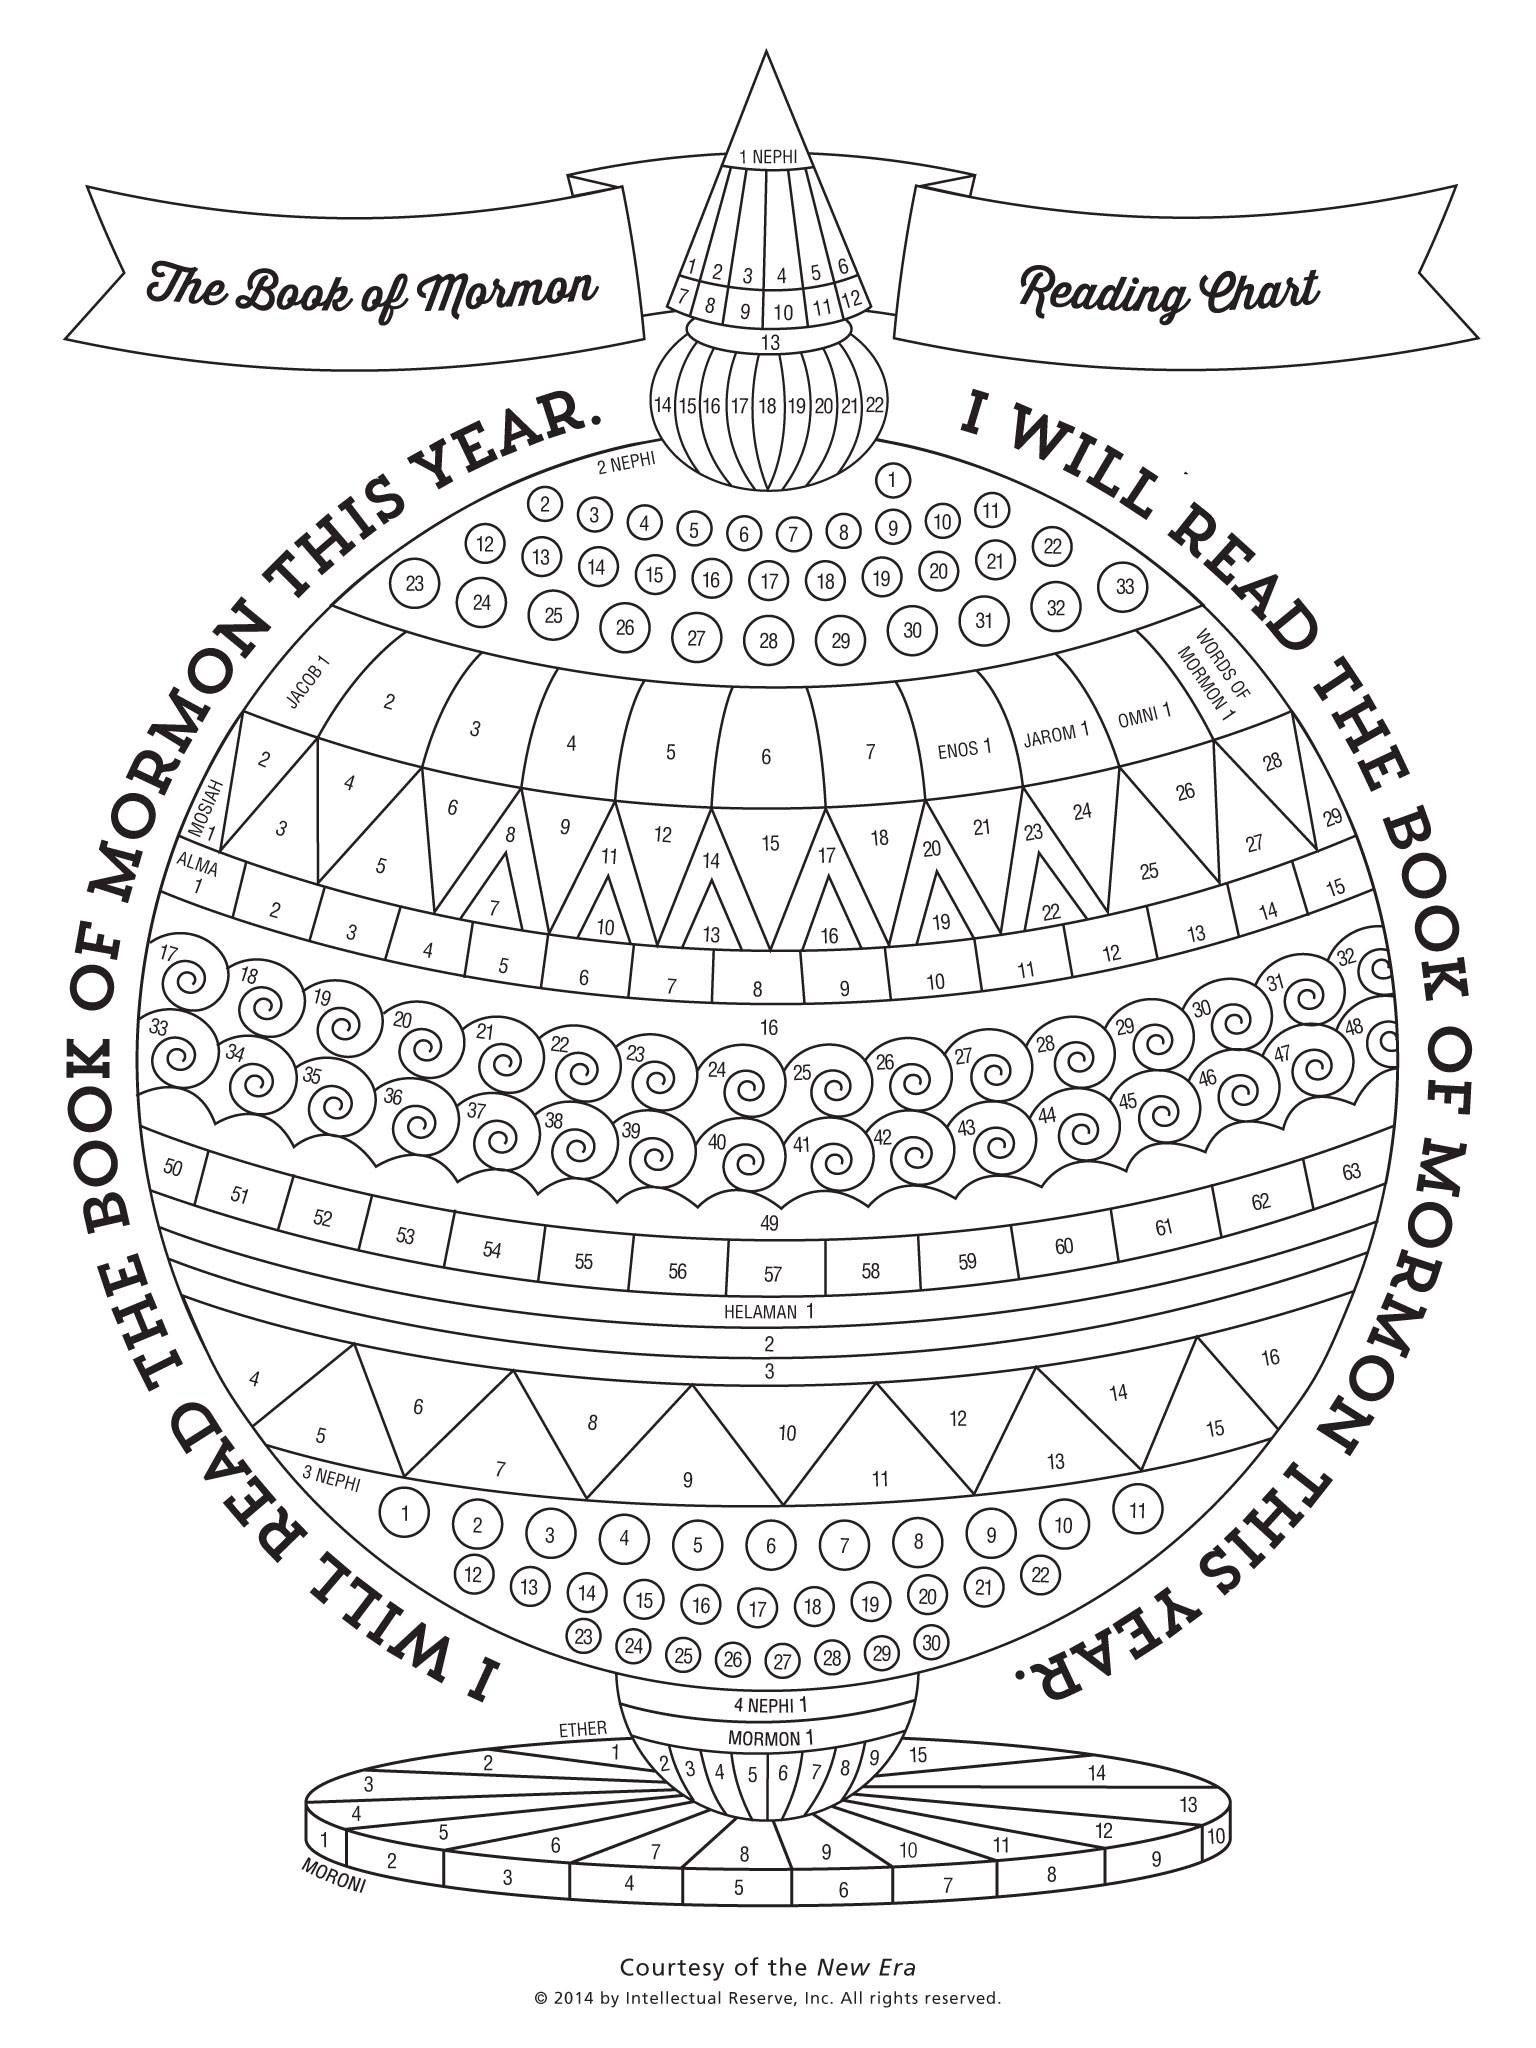 Book of Mormon reading chart | Erica | Pinterest | Mormones, Lectura ...